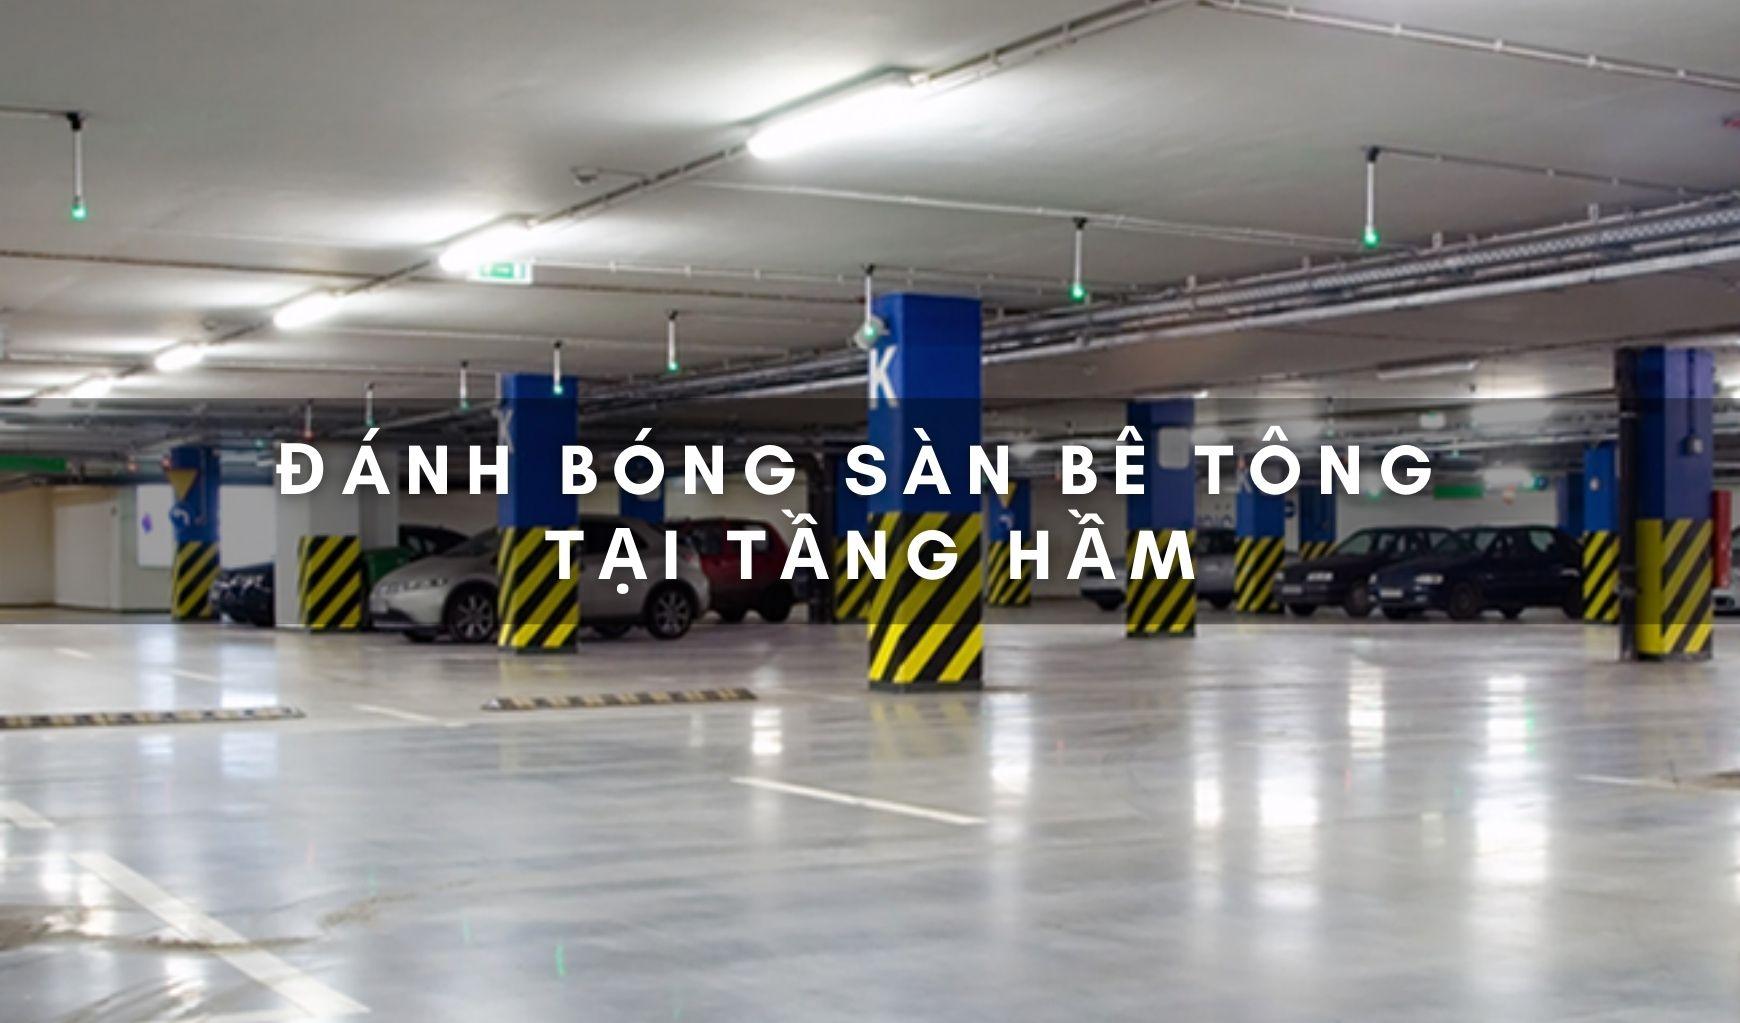 mai-san-be-tong-tai-tang-ham